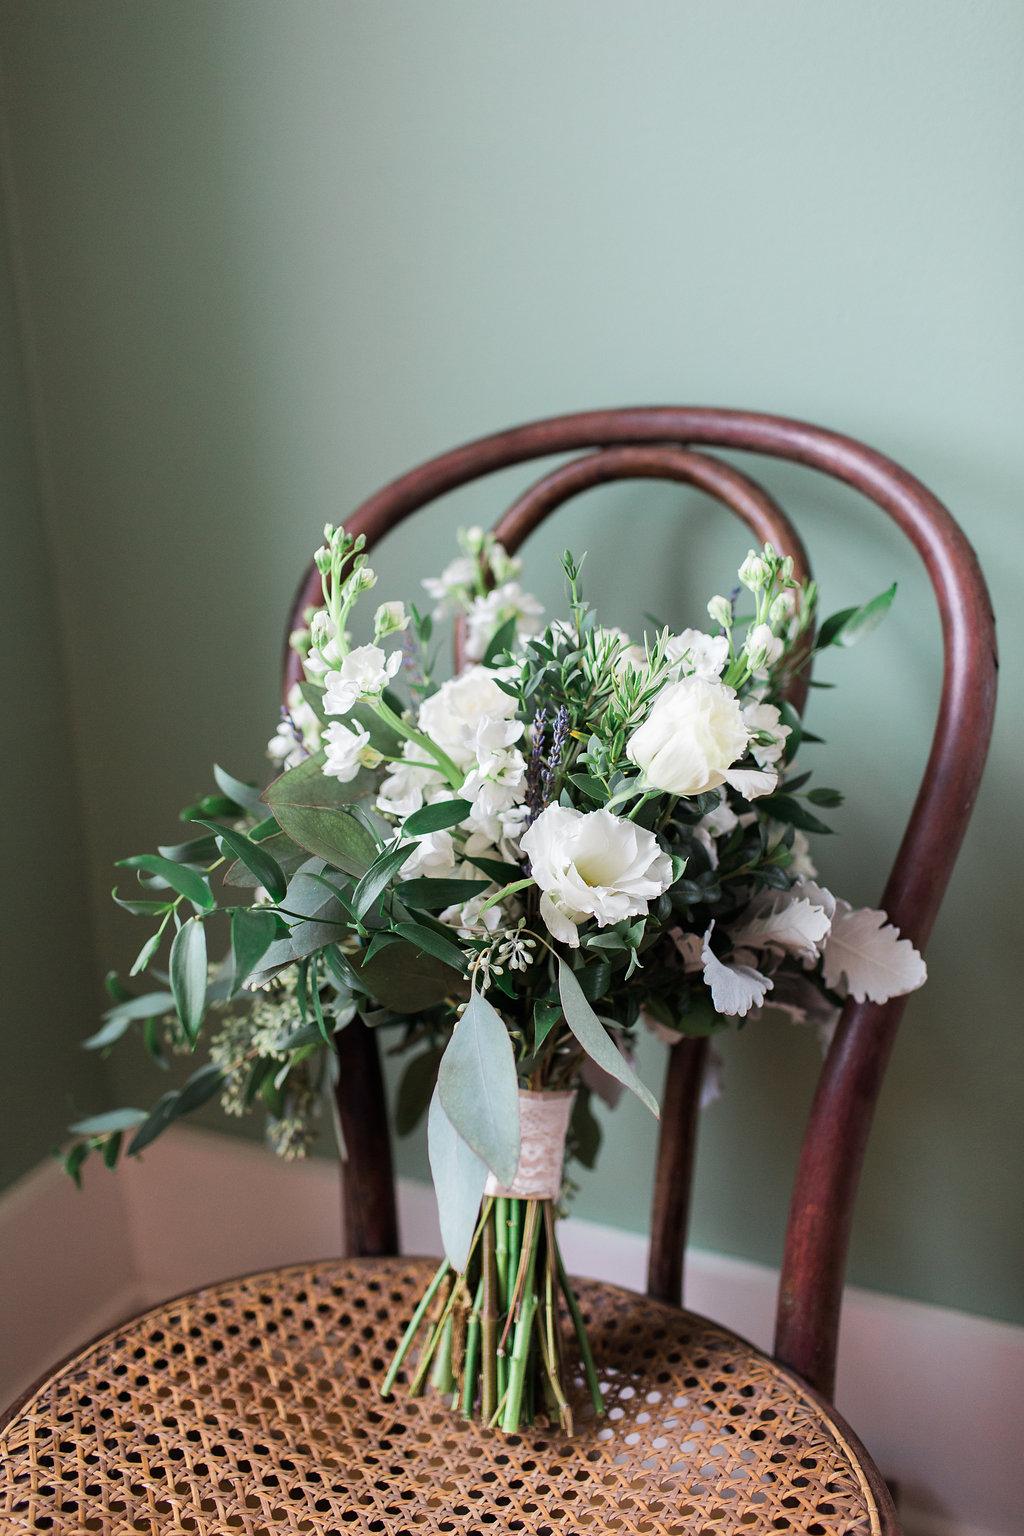 stacey-and-tj-wedding-apartment-b-photography-ivory-and-beau-bridal-boutique-savannah-wedding-dresses-daughters-of-simone-lu-boho-bride-boho-wedding-savannah-boho-wedding-savannah-weddings-savannah-bridal-gowns-savannah-wedding-7.jpg